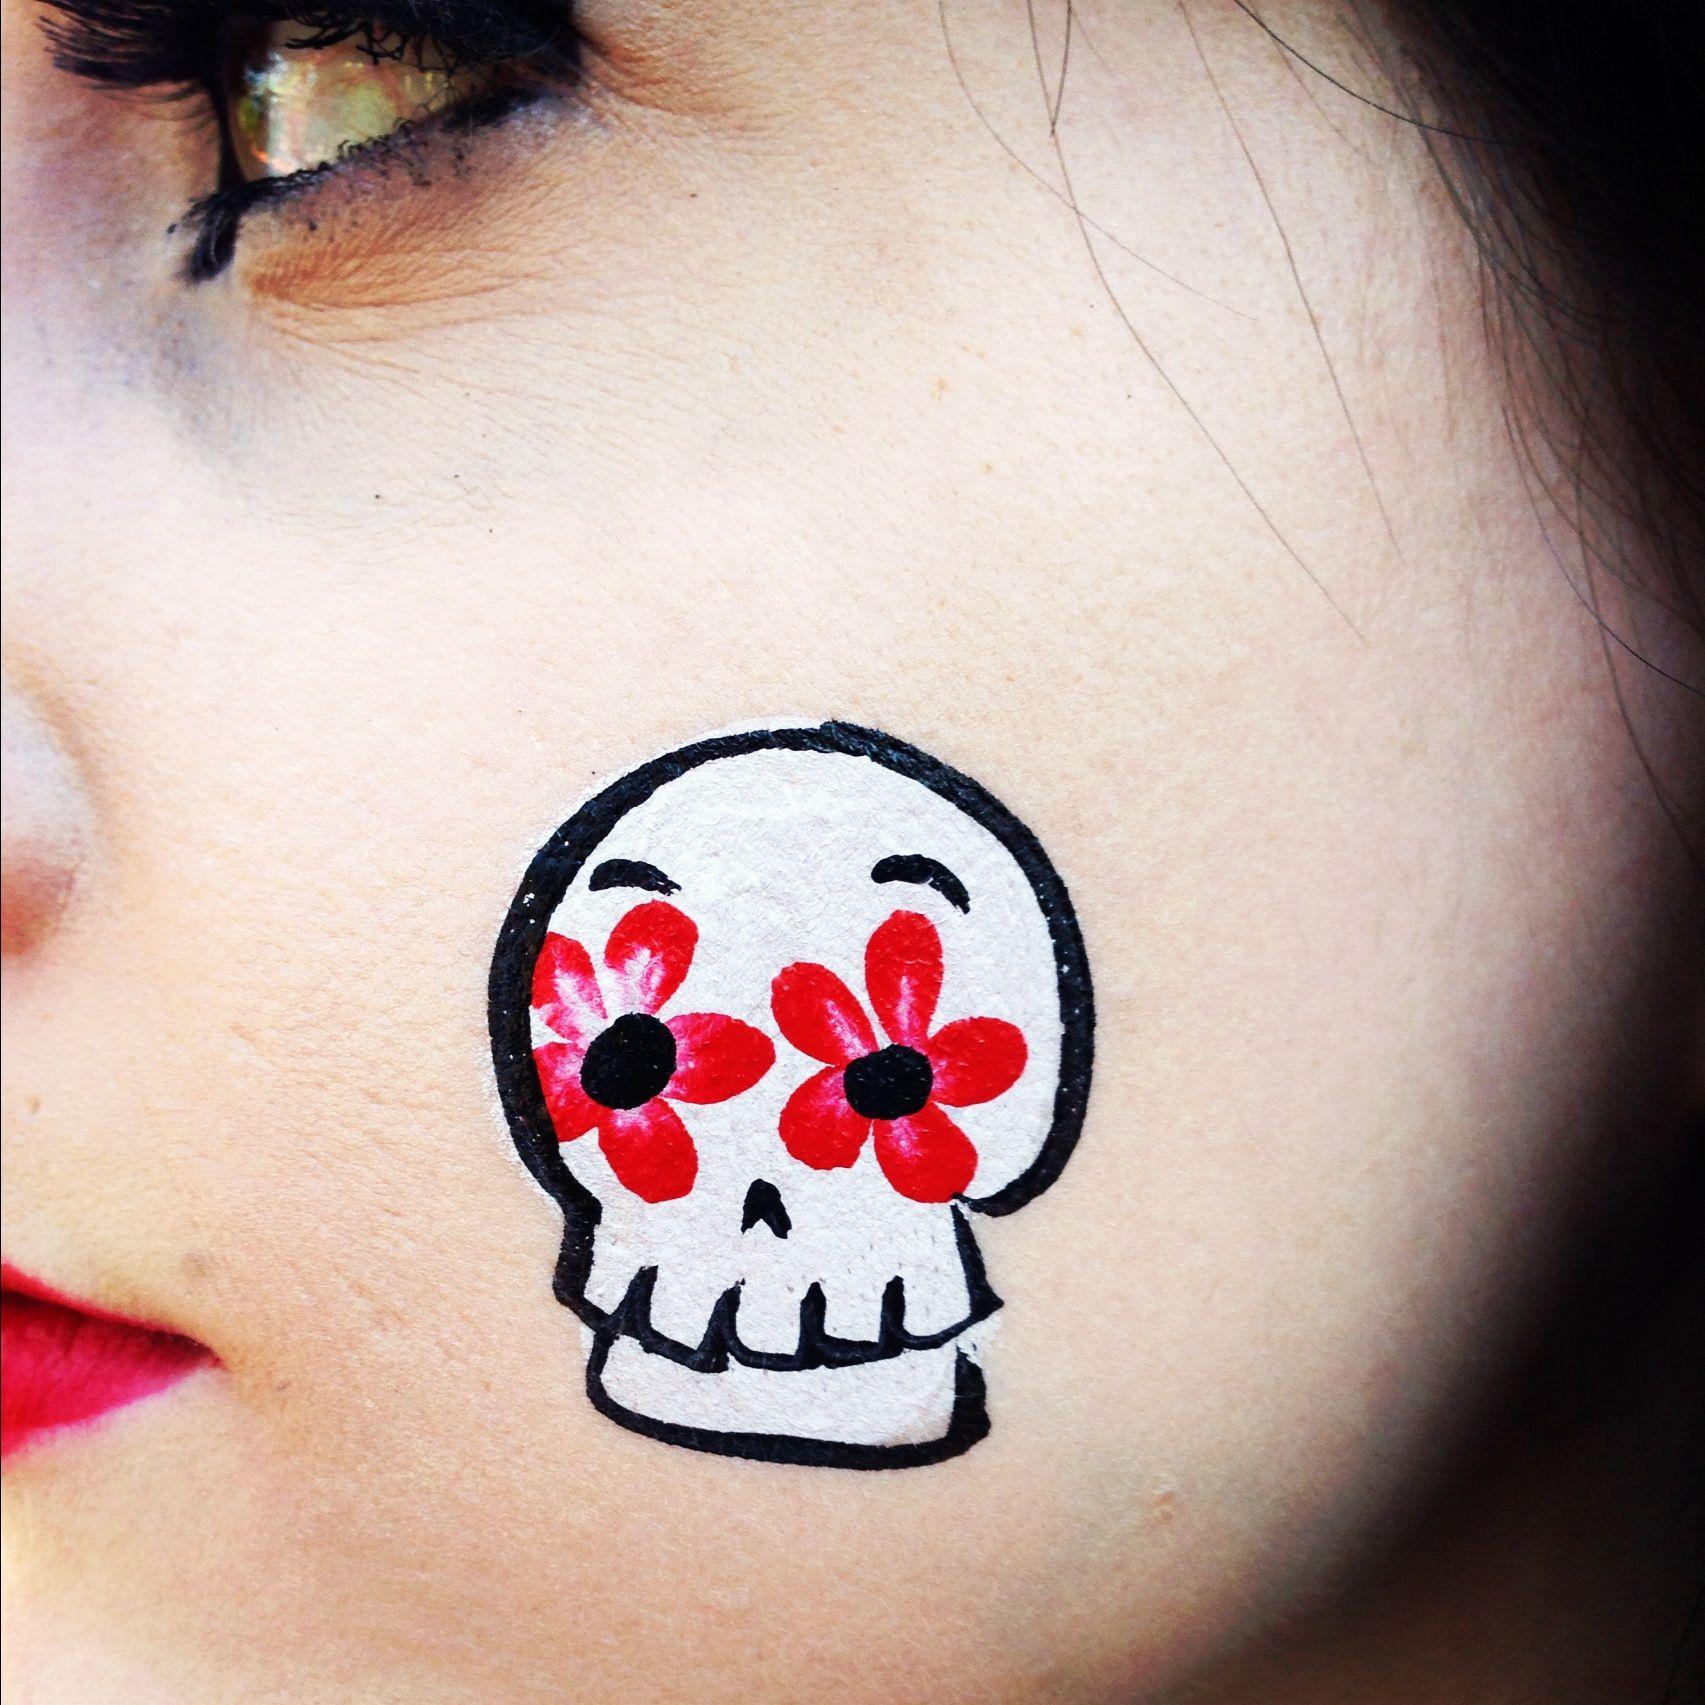 Face Painting Looks Like Dia De Los Muertos Face Painting